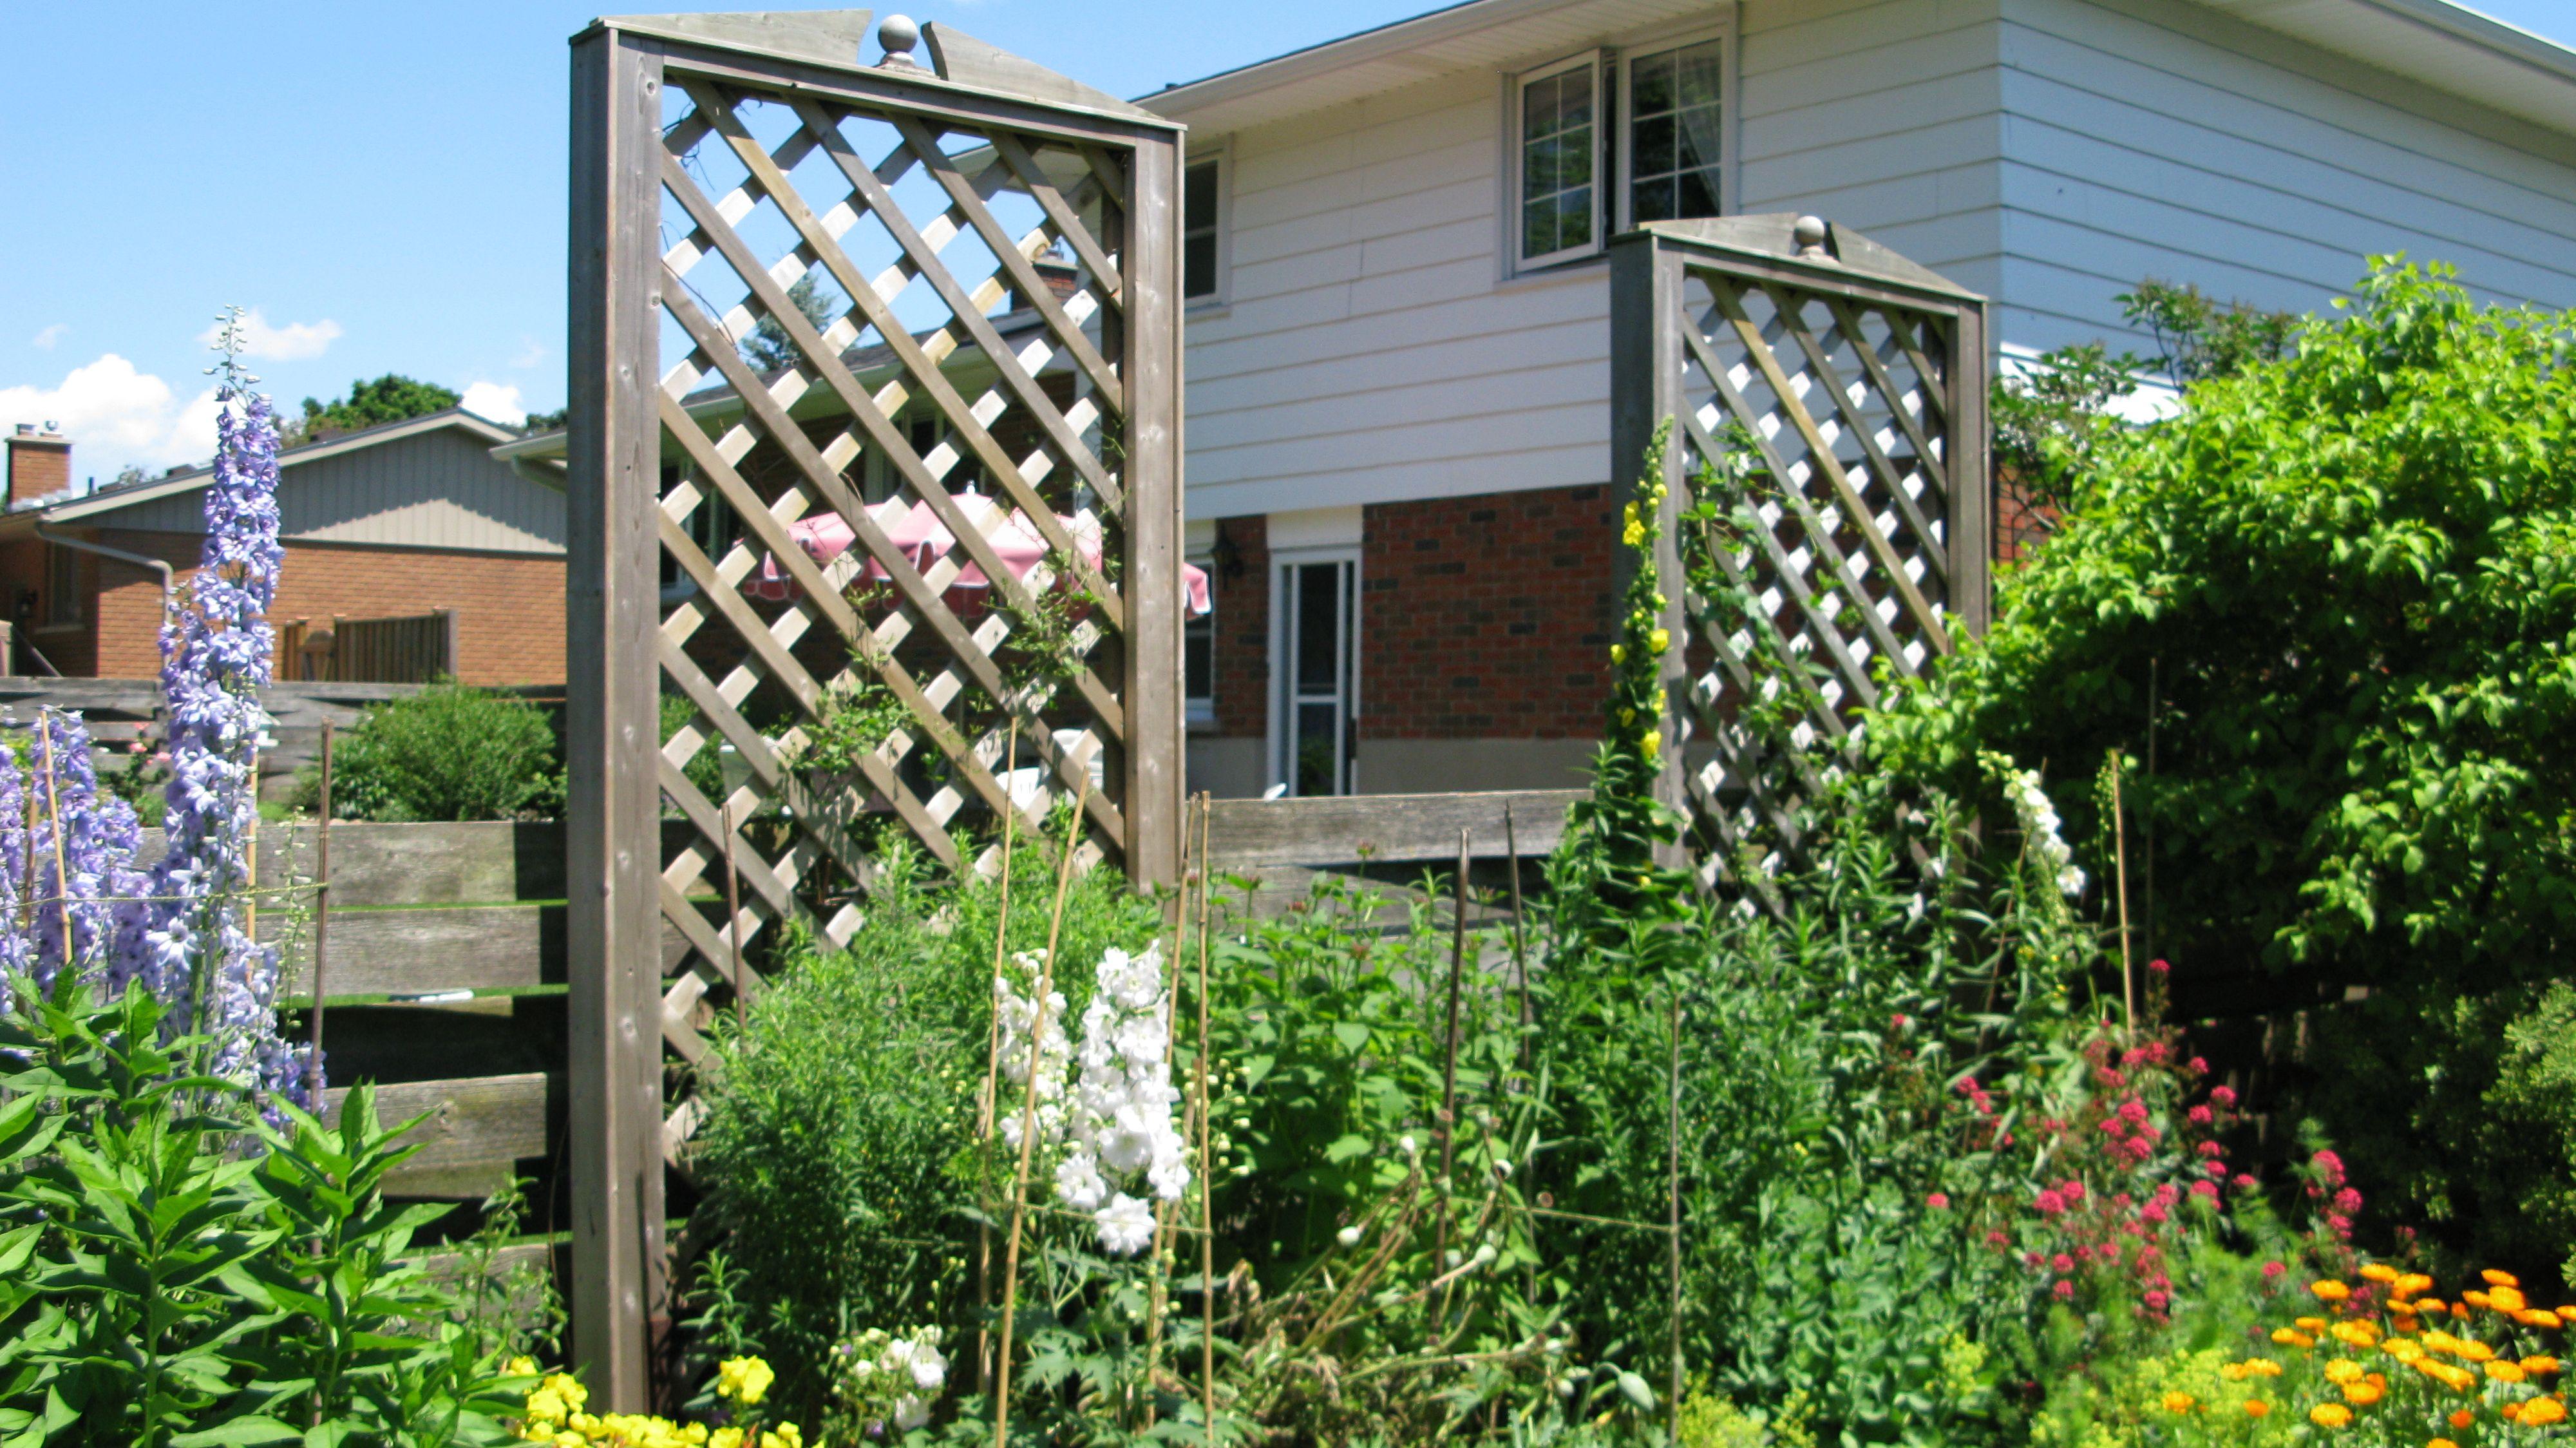 Best 25 bq fence panels ideas only on pinterest raised gardens best 25 bq fence panels ideas only on pinterest raised gardens vegetable garden fences and fence garden baanklon Choice Image